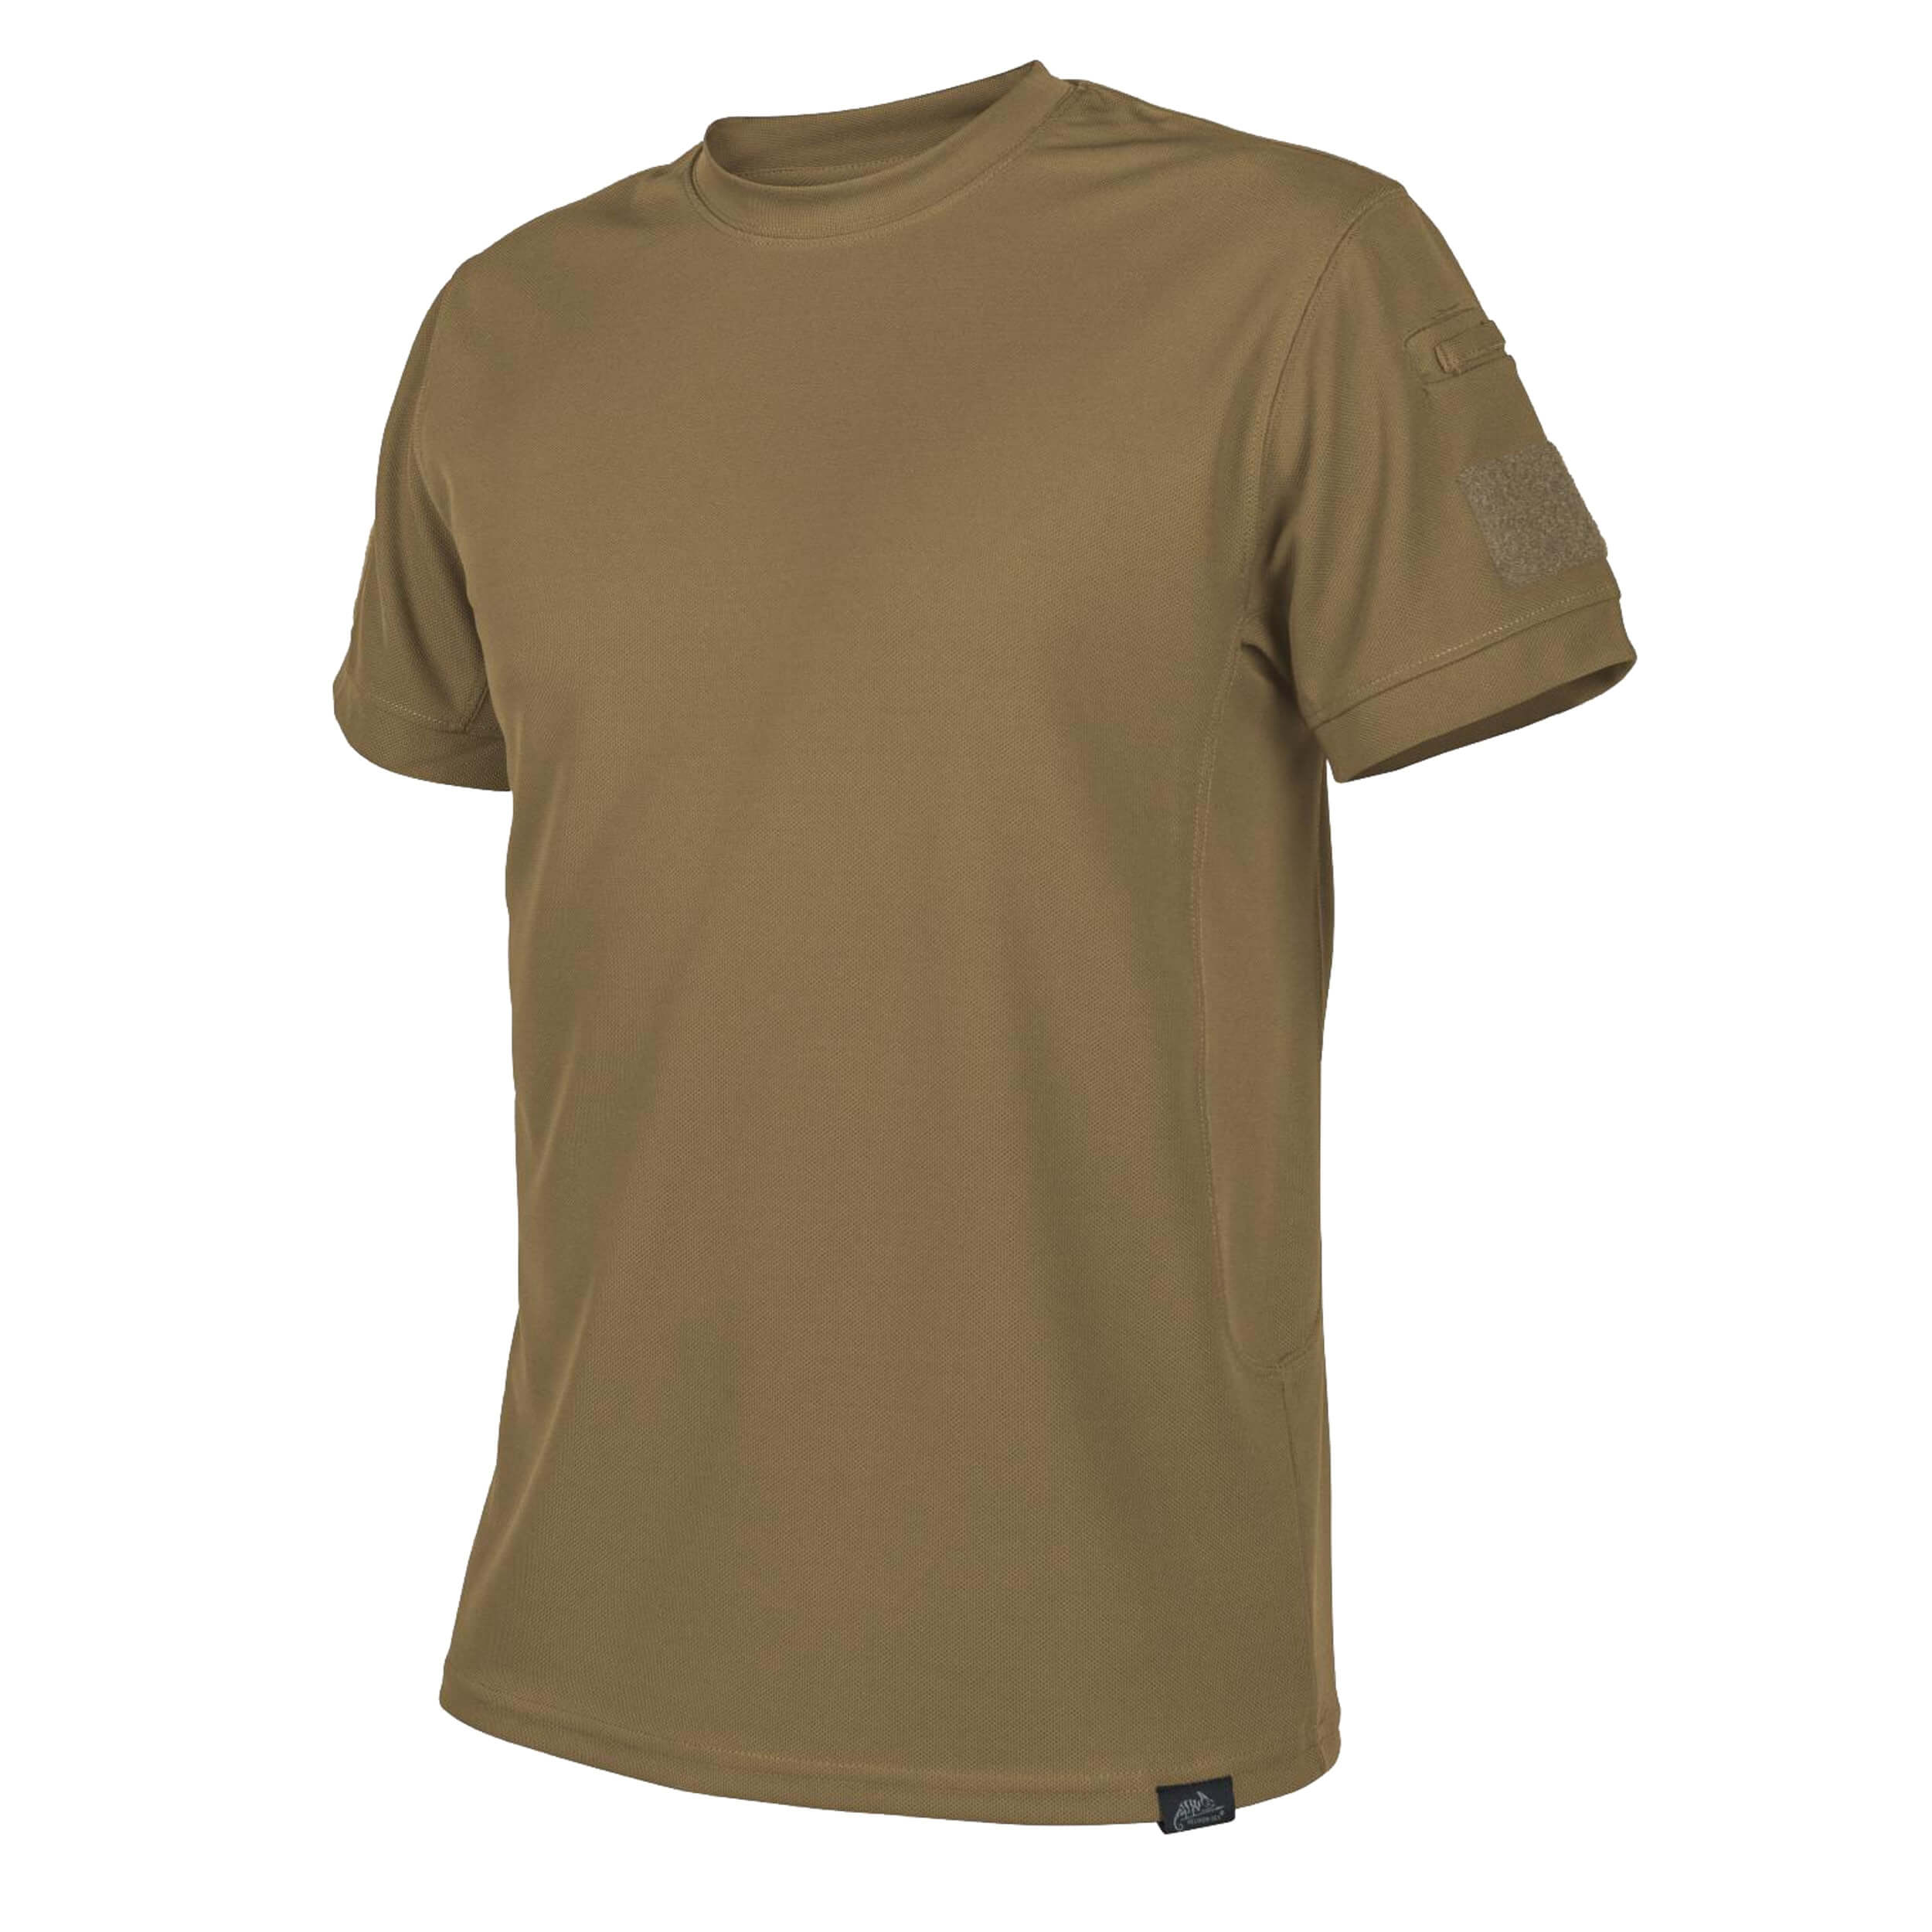 Helikon-Tex Tactical T-Shirt -Top Cool- Coyote